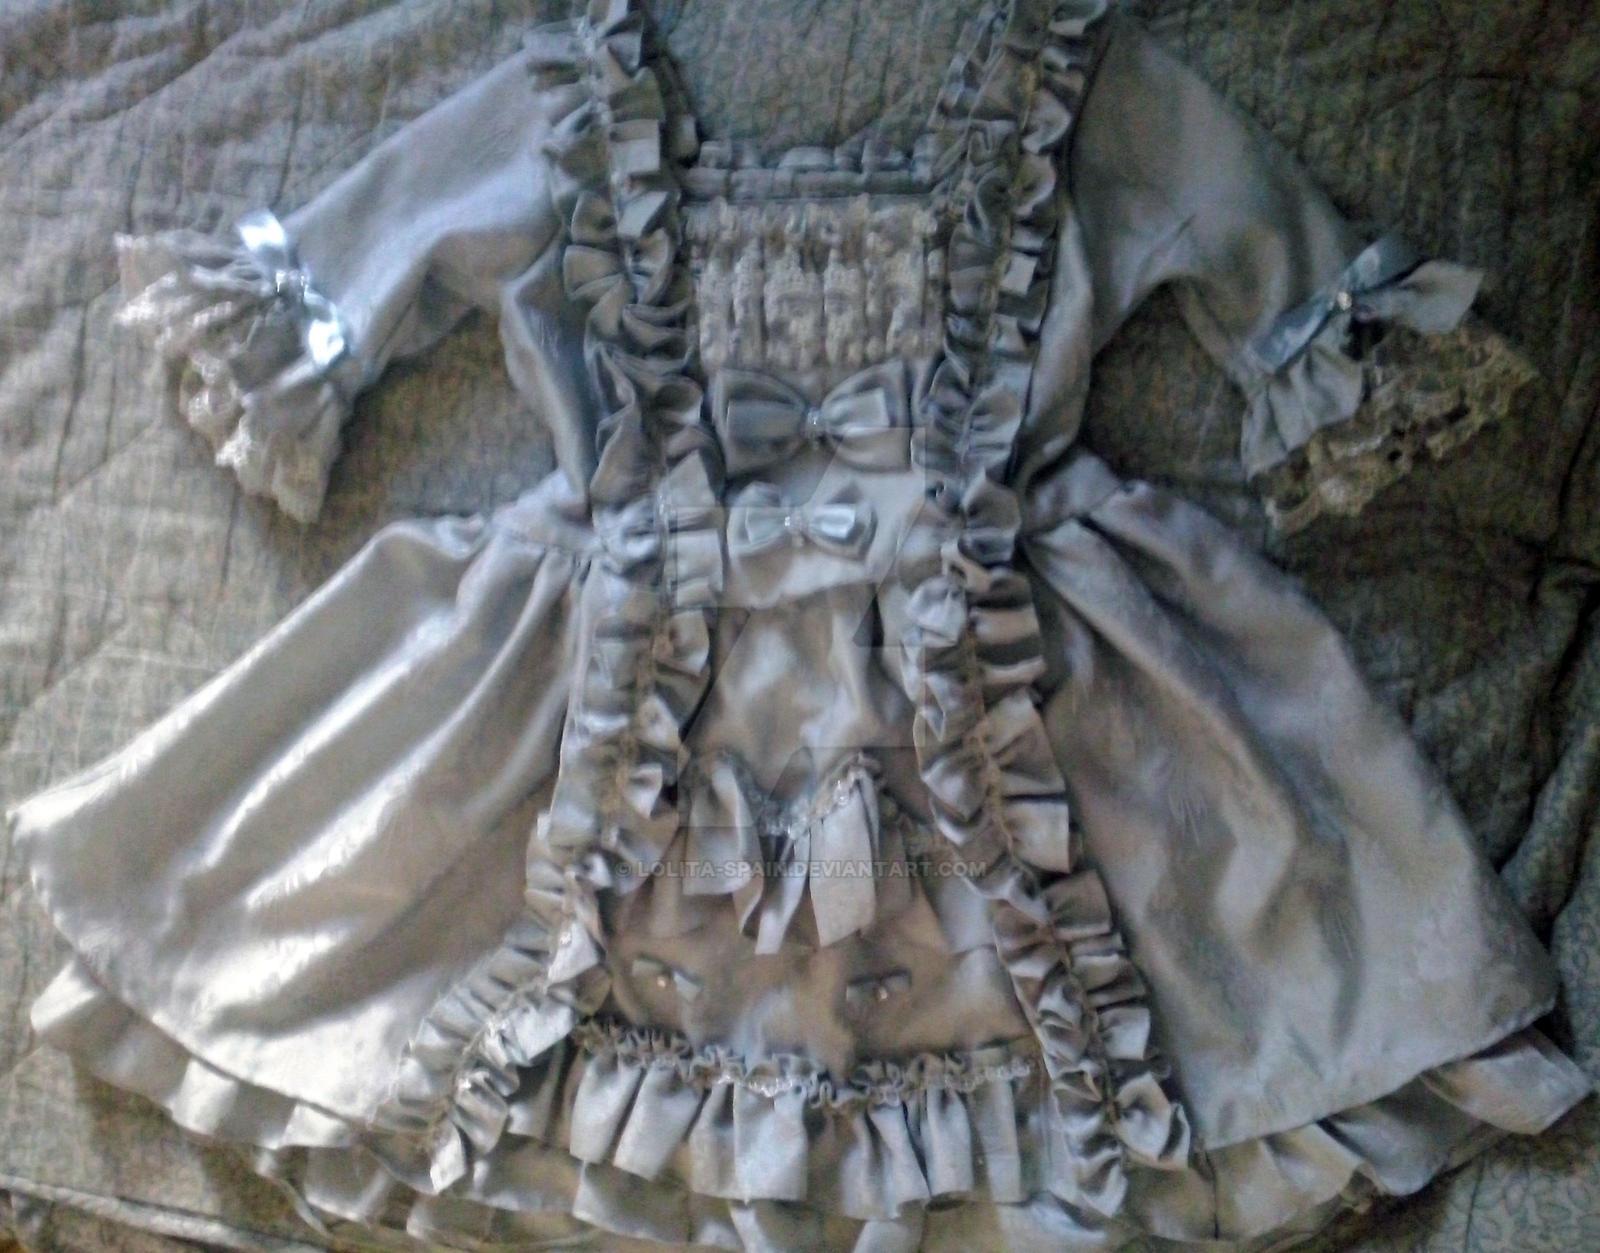 Robe a la francaise inspired lolita dress by lolita-spain